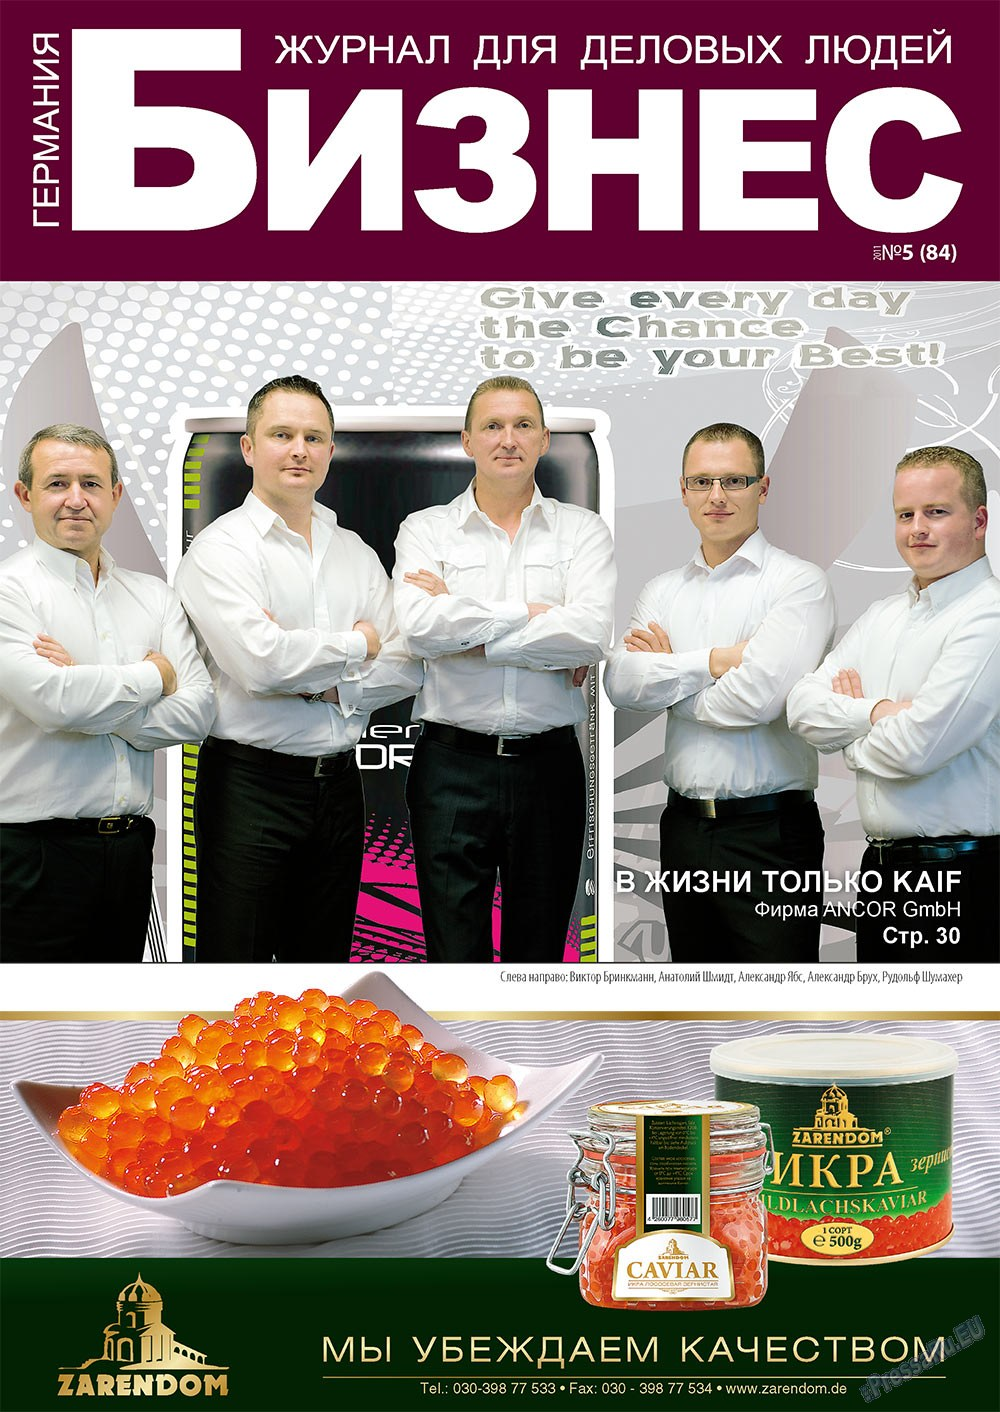 Бизнес (журнал). 2011 год, номер 5, стр. 1